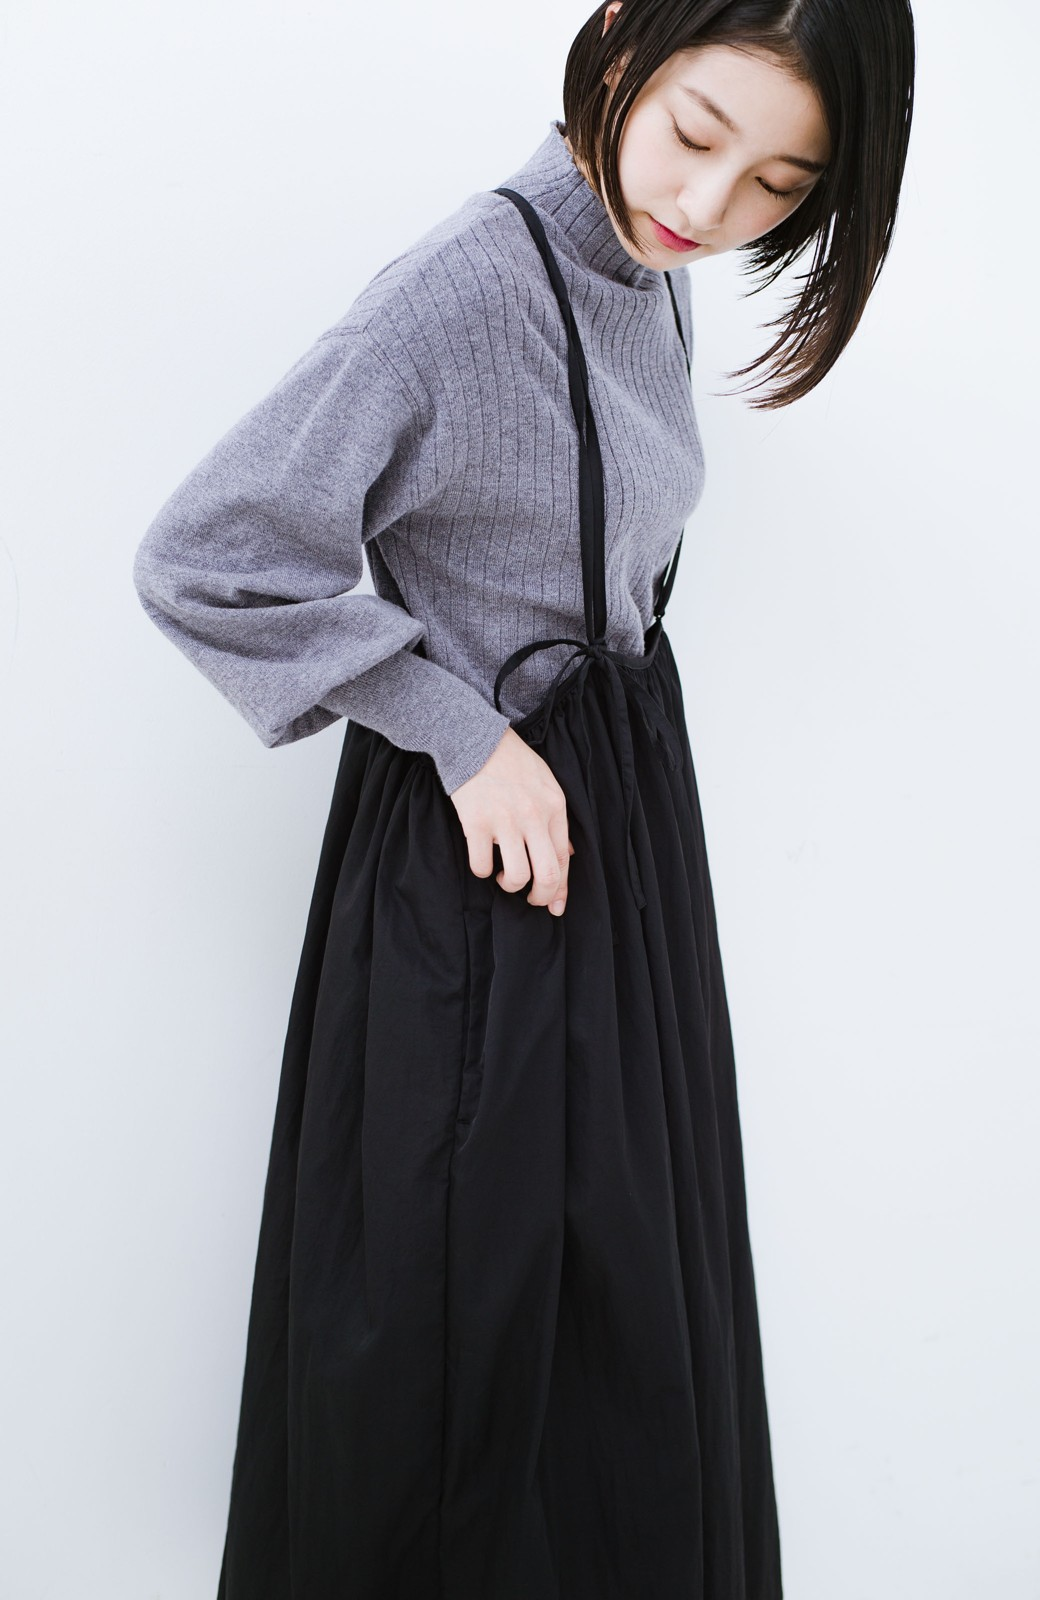 haco! 女の子バンザイ!プロジェクト【ブルー期】 ニットですら重ね着できる安心さ ゆったりギャザーキャミワンピ <ブラック>の商品写真19